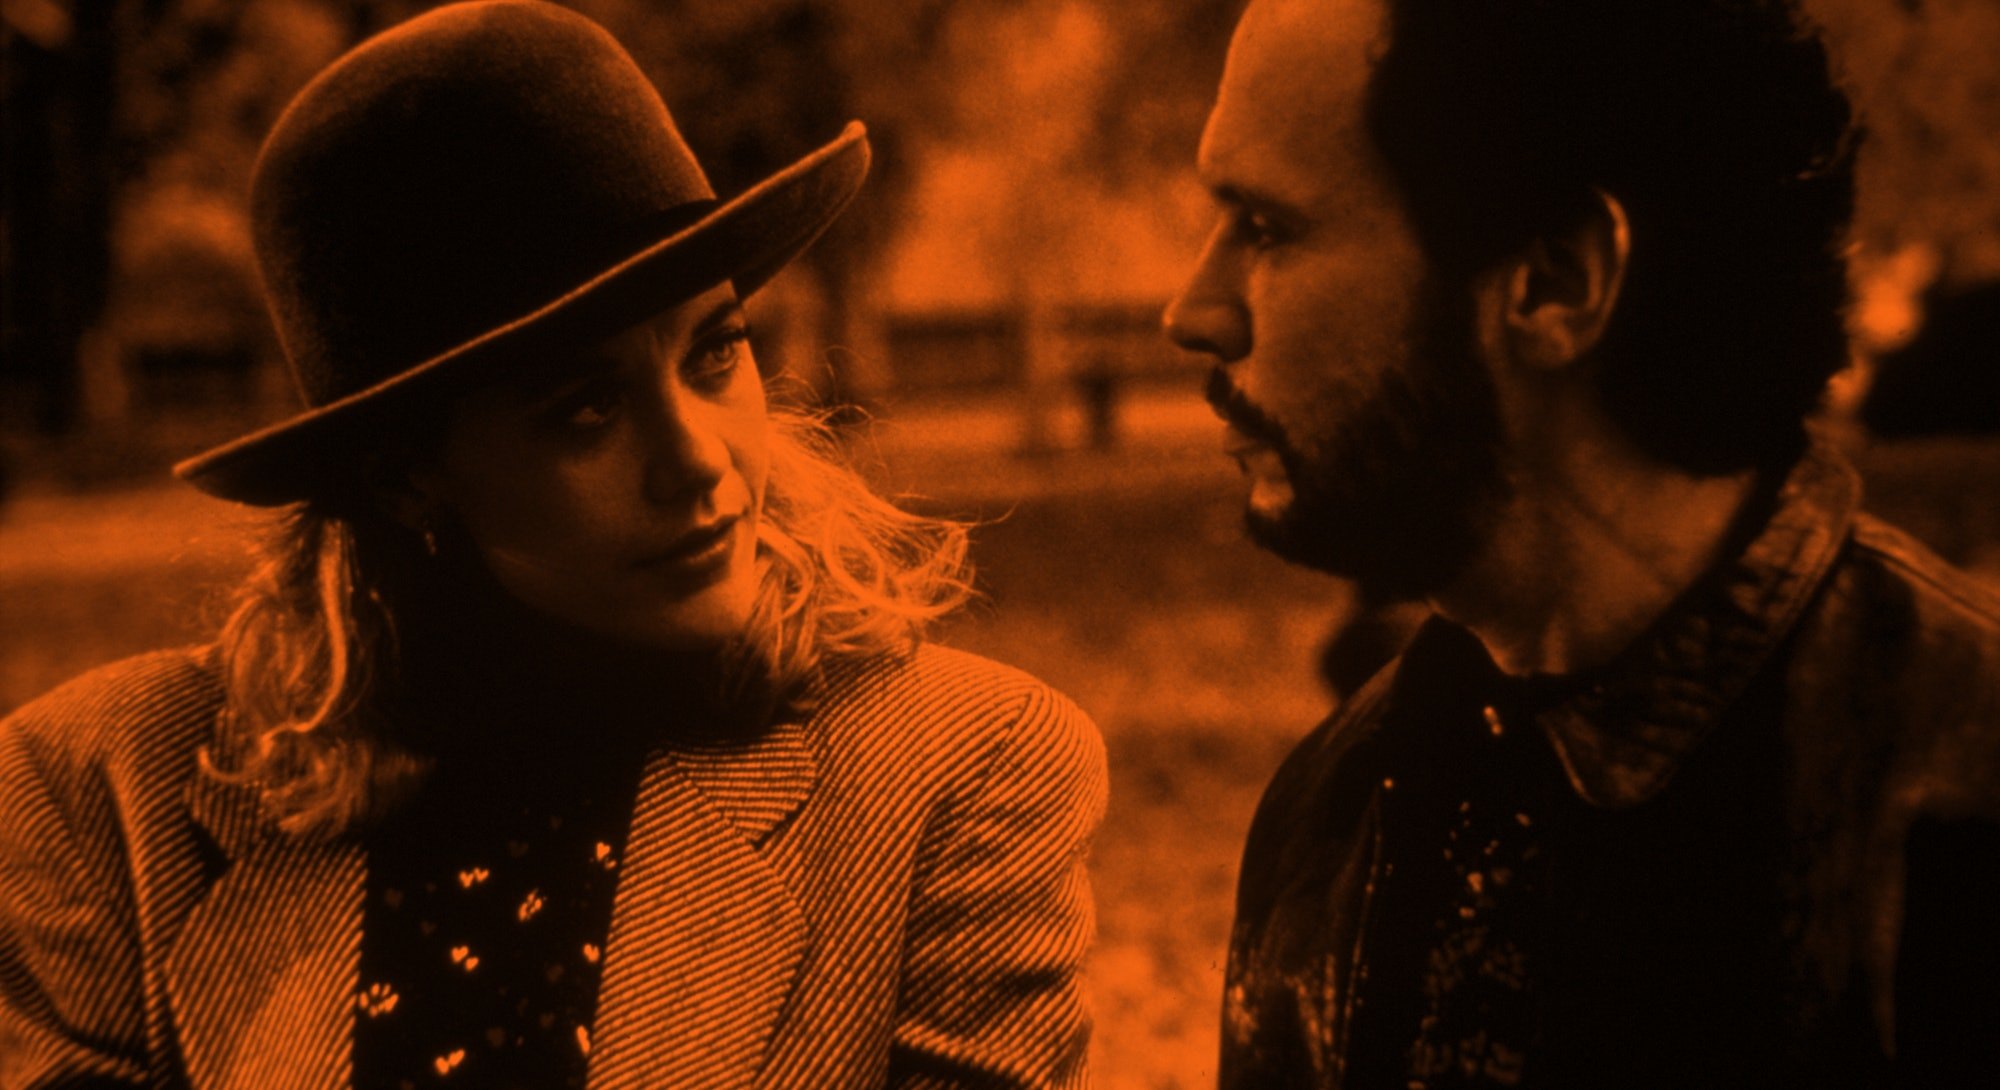 FILM STILLS OF 'WHEN HARRY MET SALLY' WITH 1989, BILLY CRYSTAL, ROB REINER, MEG RYAN IN 1989